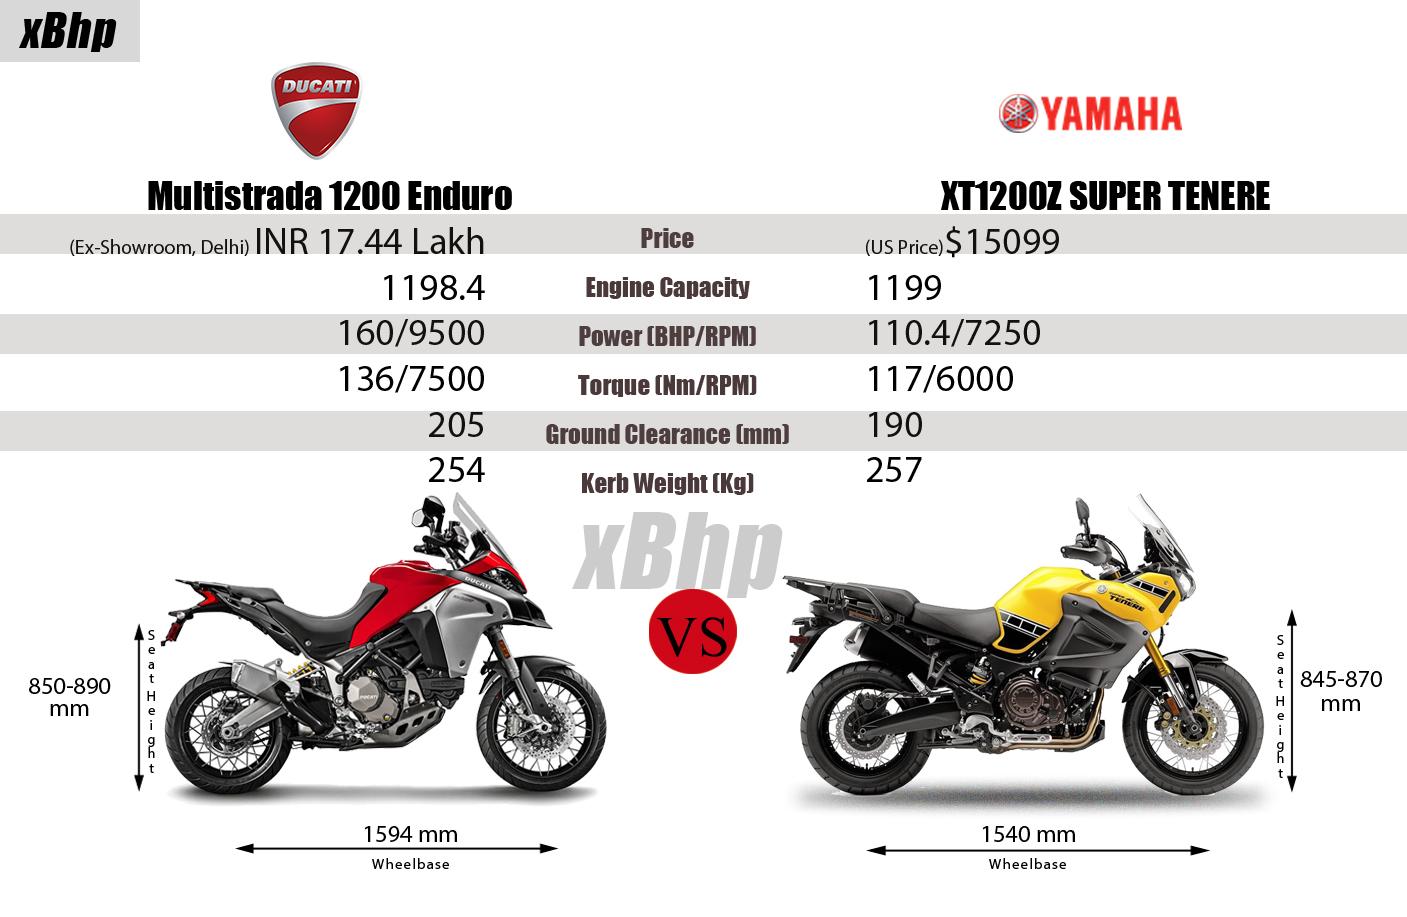 Multistrada Vs Yamaha Super Tenere